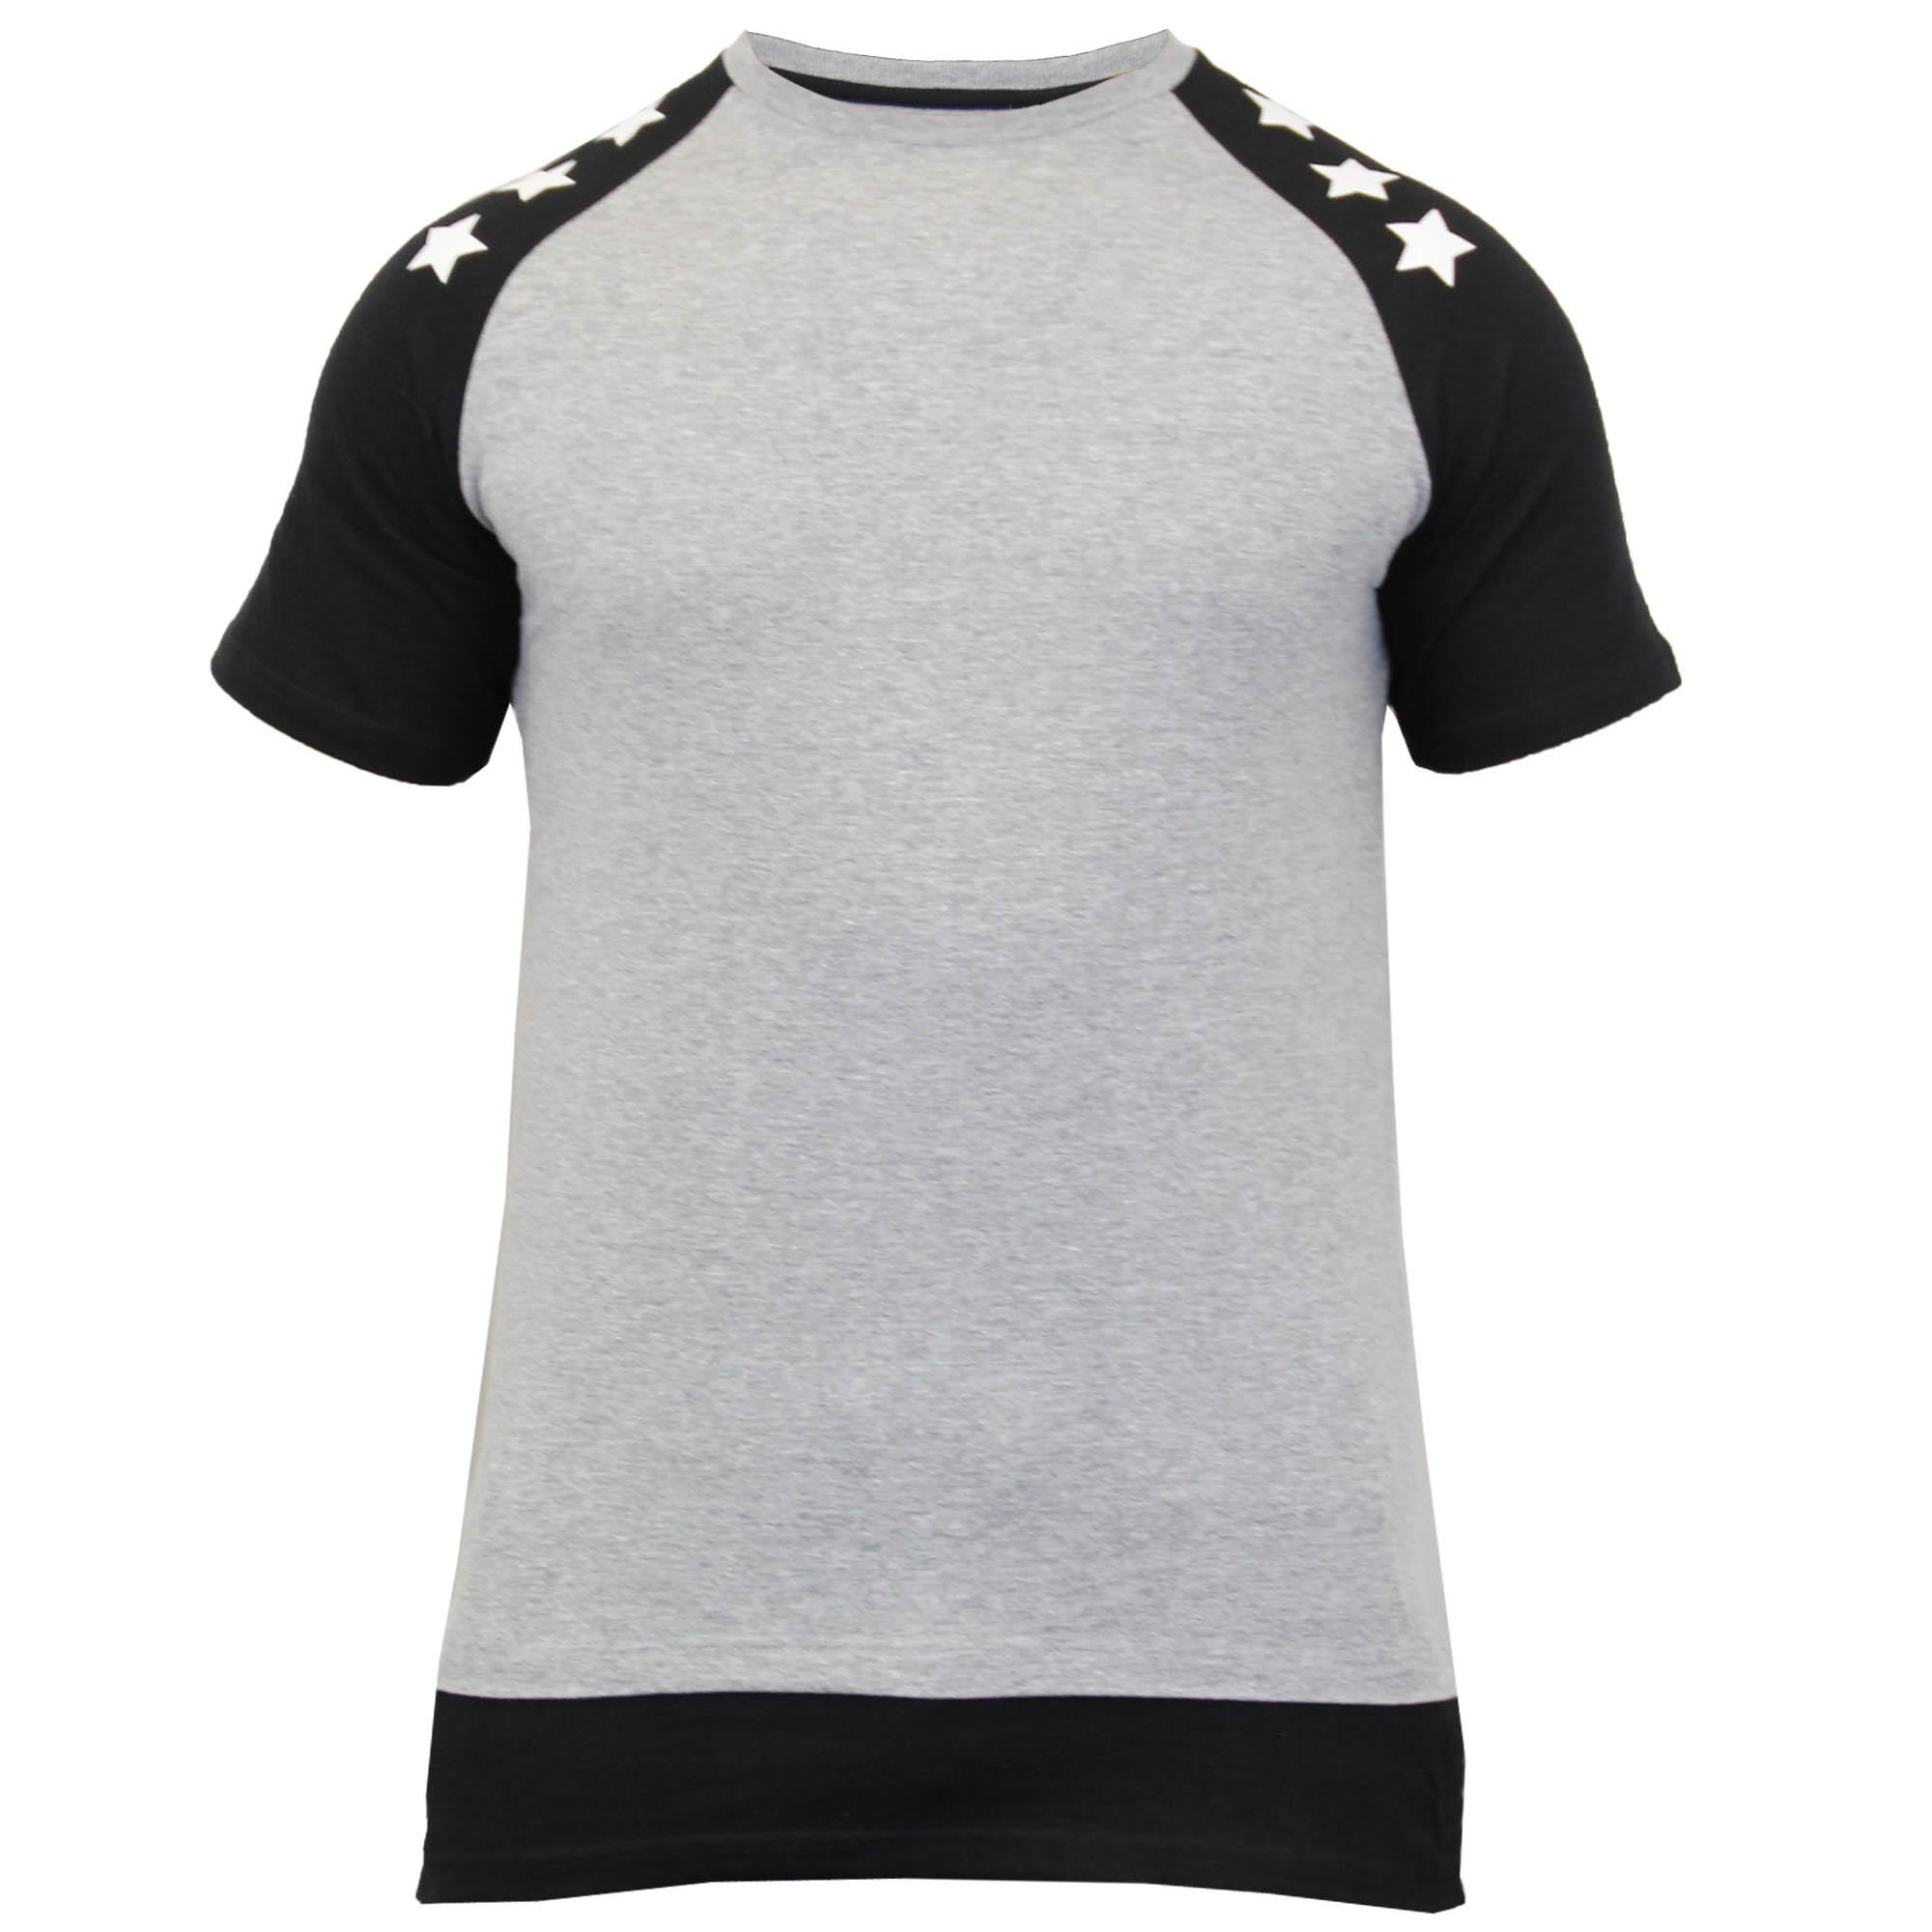 Mens long line t shirt by soul star short sleeved ebay for Long line short sleeve t shirt